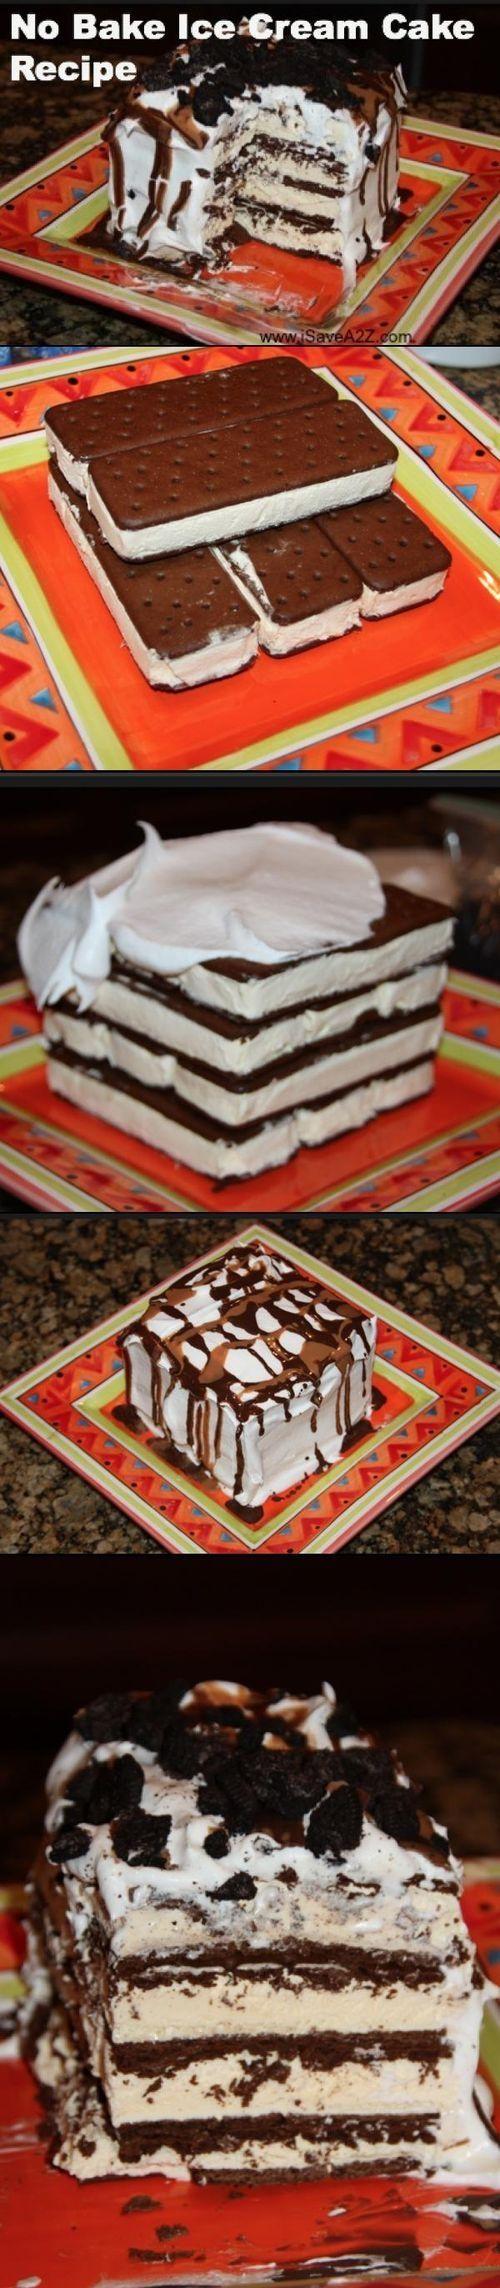 DIY No Bake Ice Cream Cake food diy party ideas diy food diy cake diy recipes diy baking diy desert diy party ideas diy birthday cake diy stuffed cakes